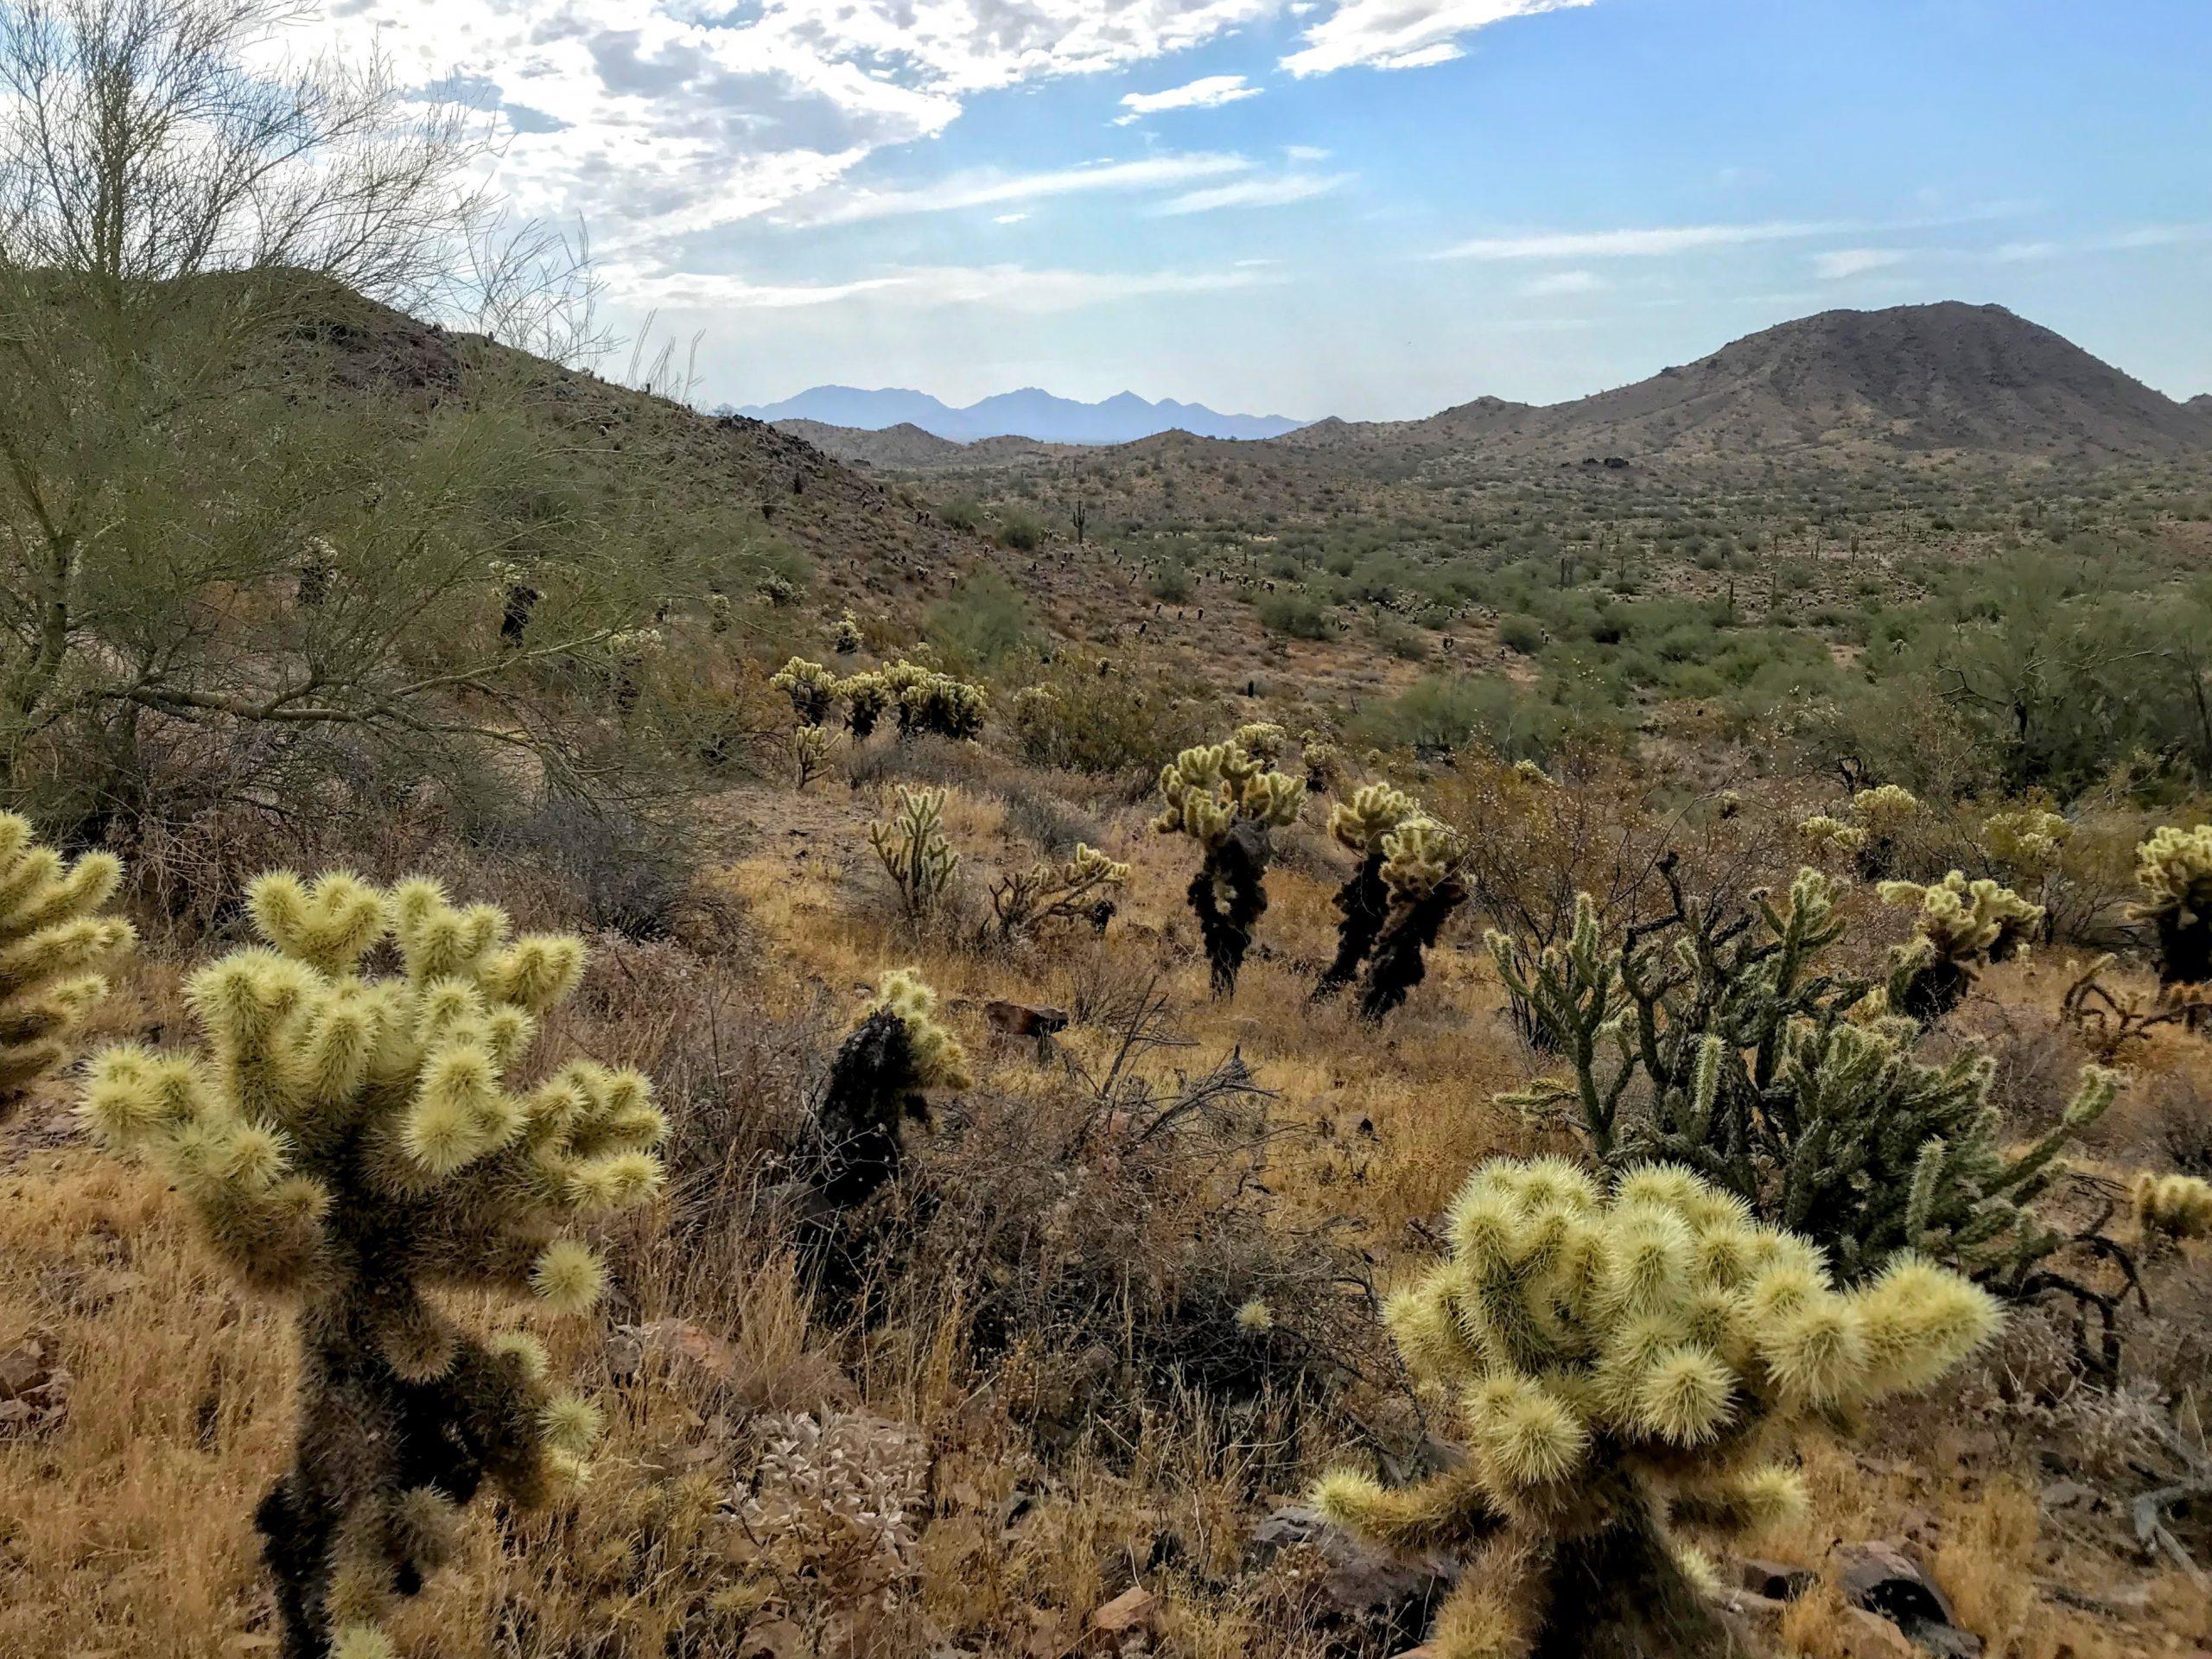 Desert Vista Trailhead Hikes, Phoenix Sonoran Preserve McDowells views